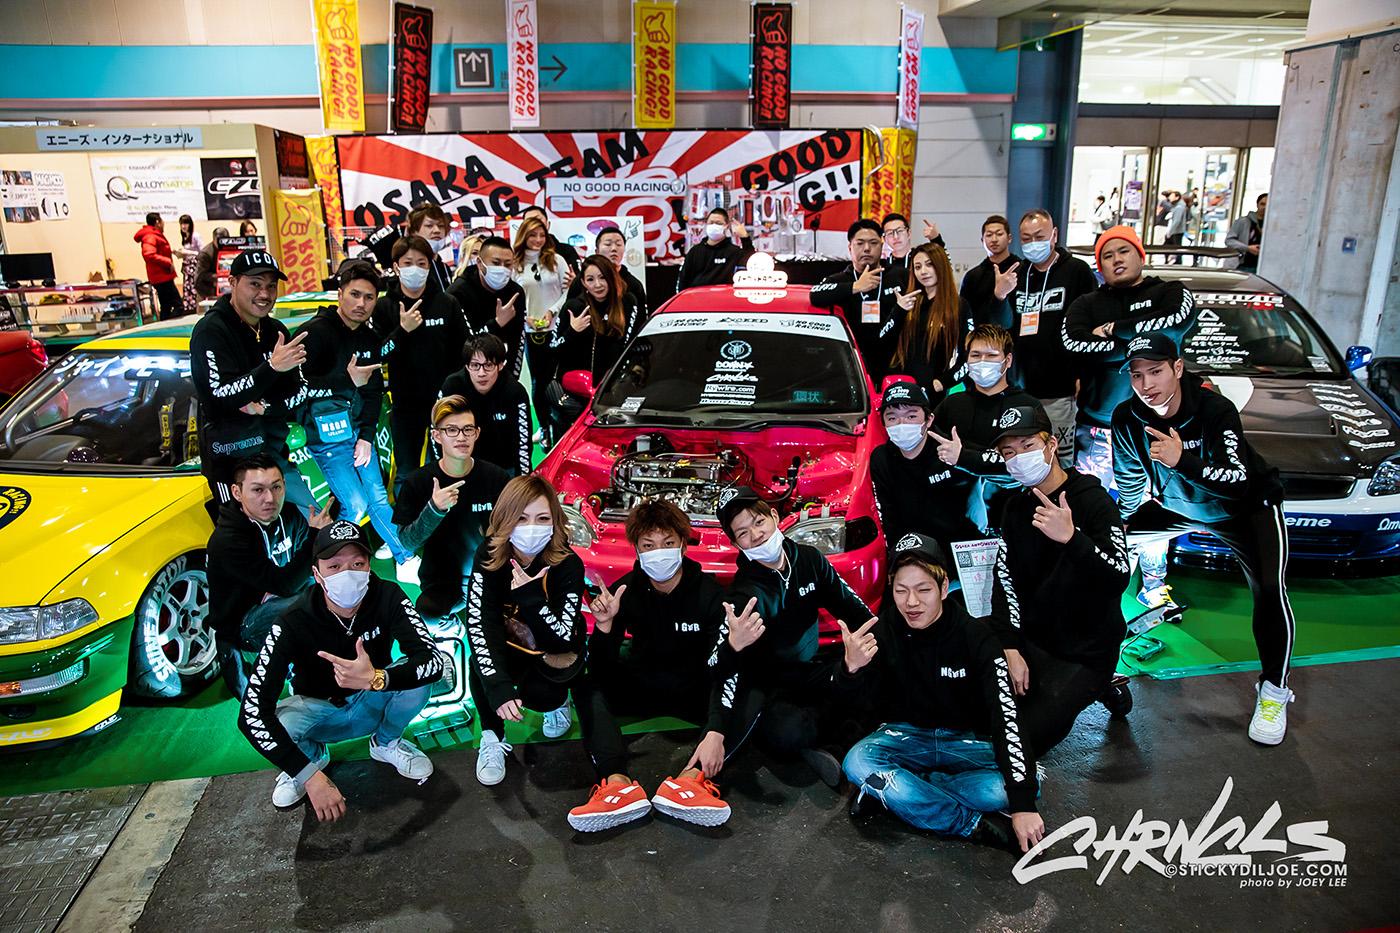 The Spirit of Kansai Car Culture – CHRNCLS Vlog 2019 #9 (Part 2)